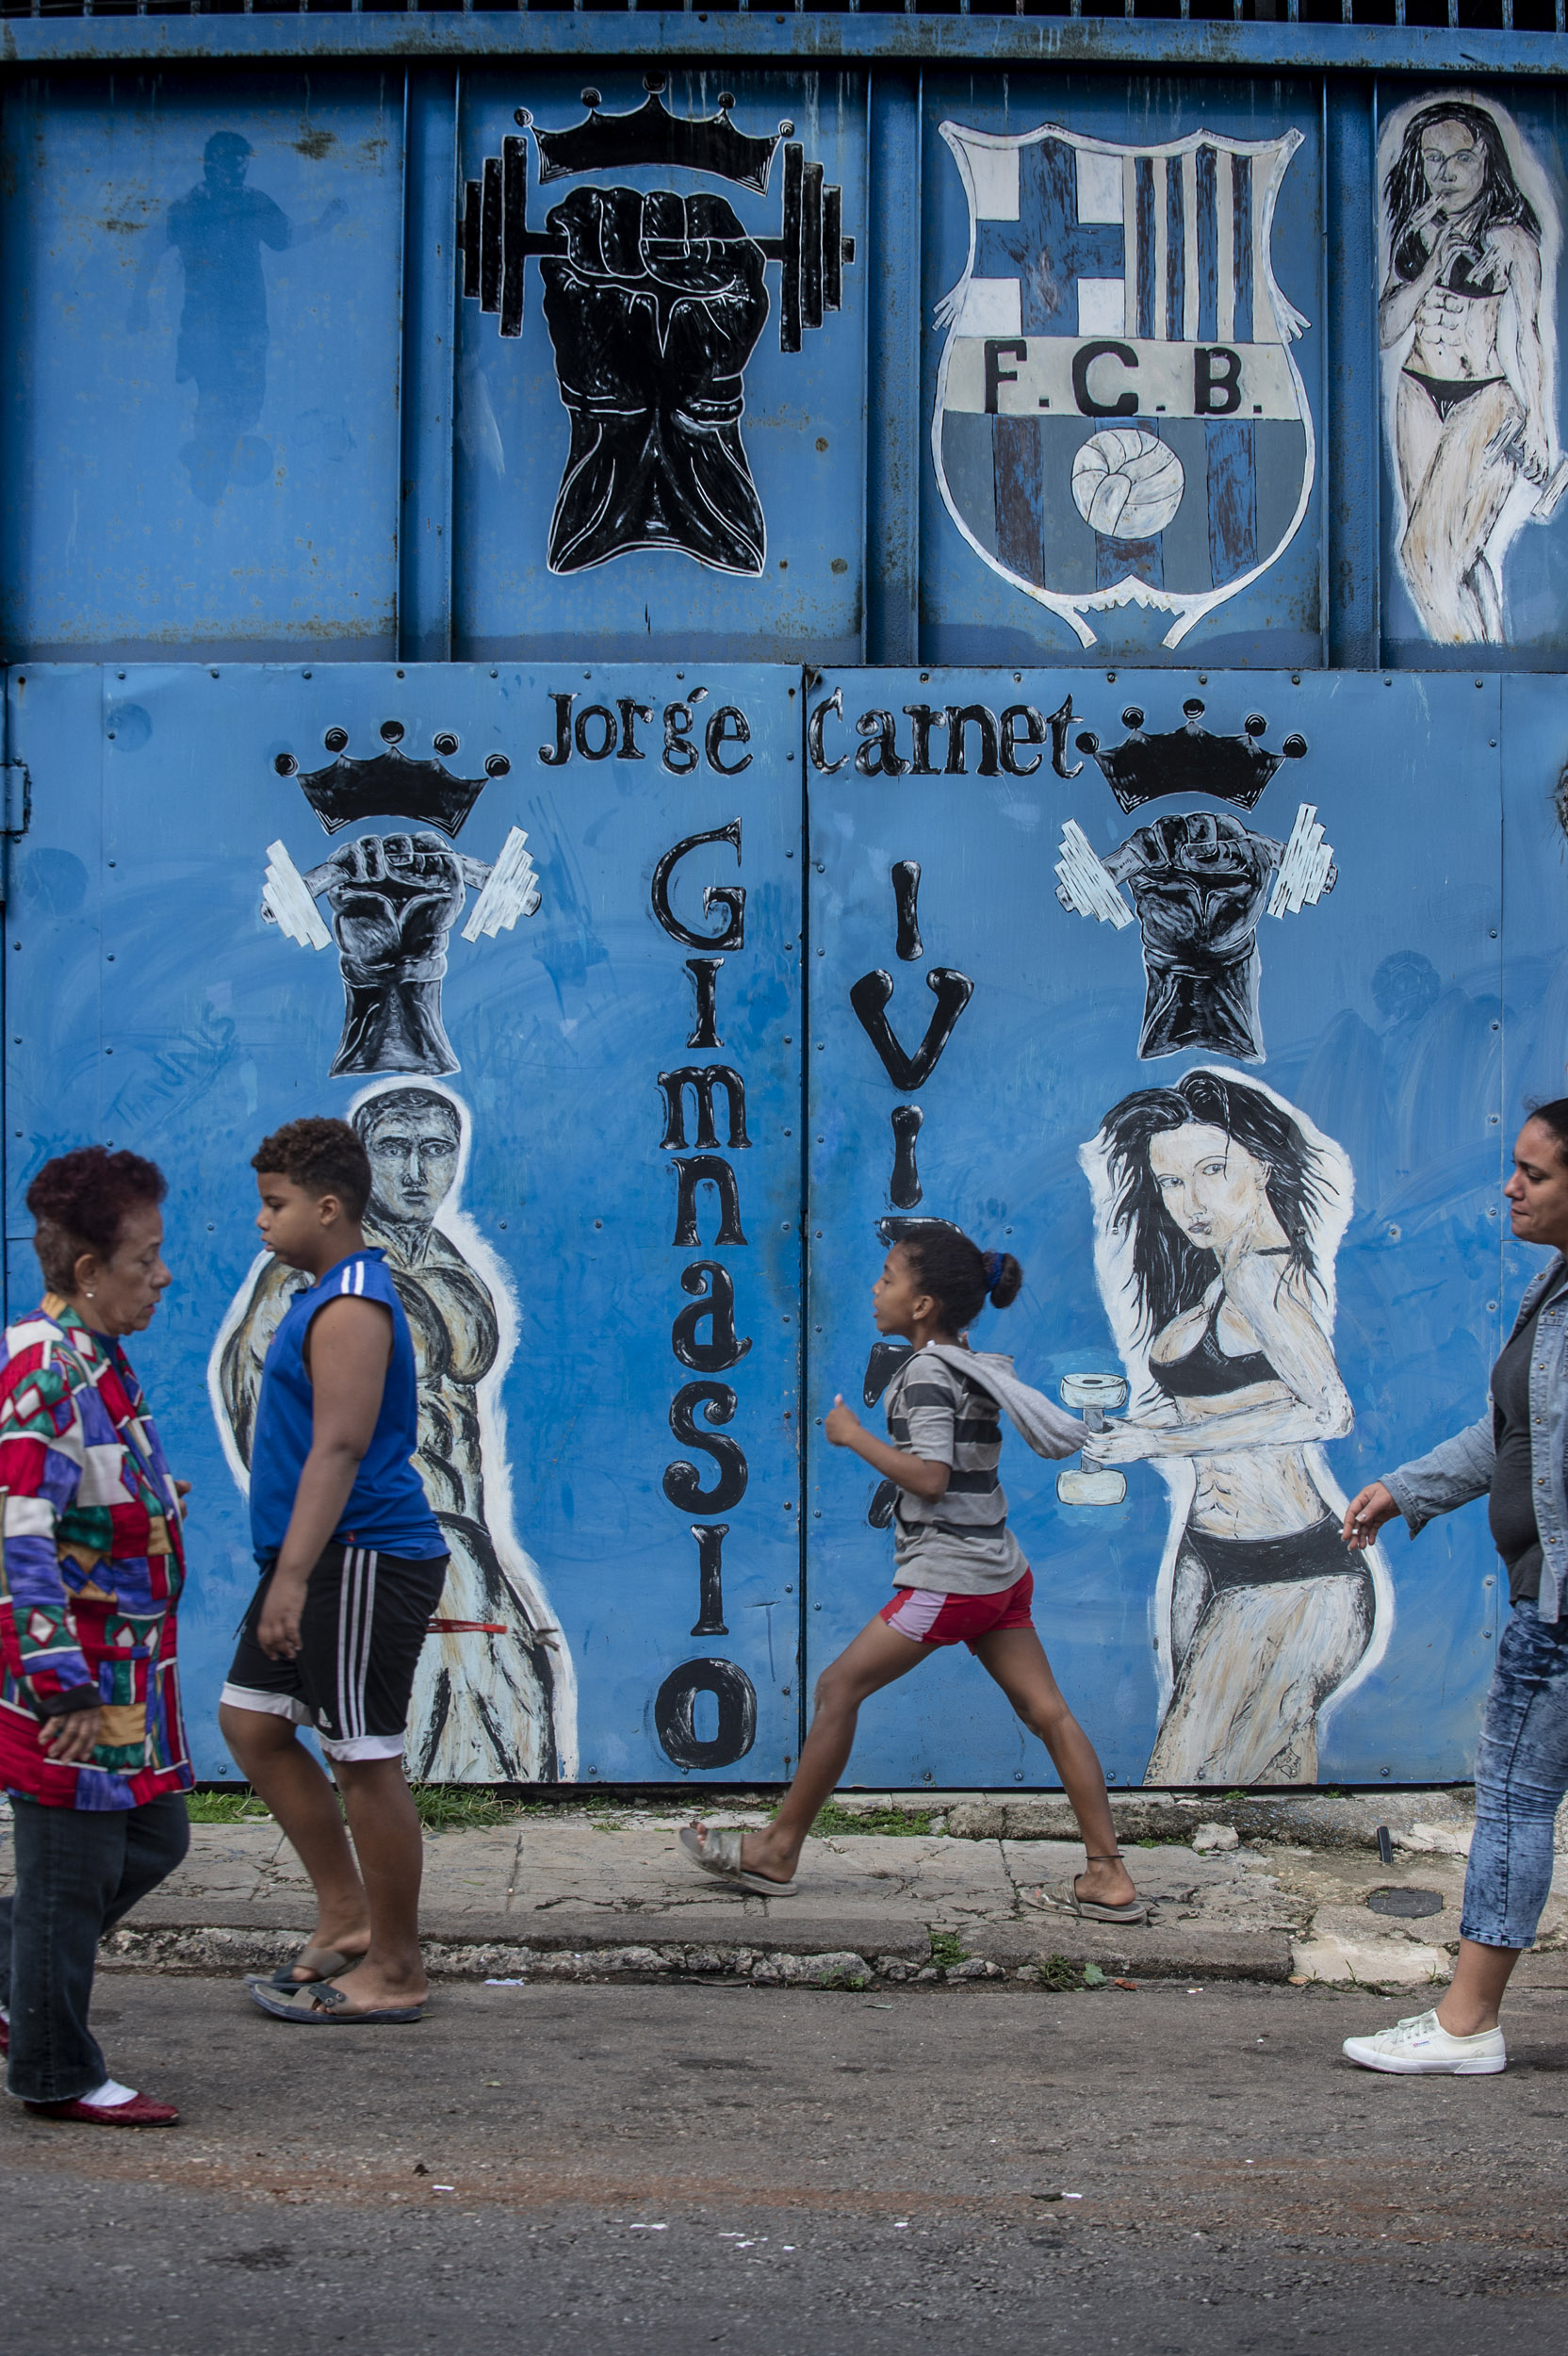 La Habana 08 - Prints 2. Ethnoland - Hector Garrido, Aerial and human photography